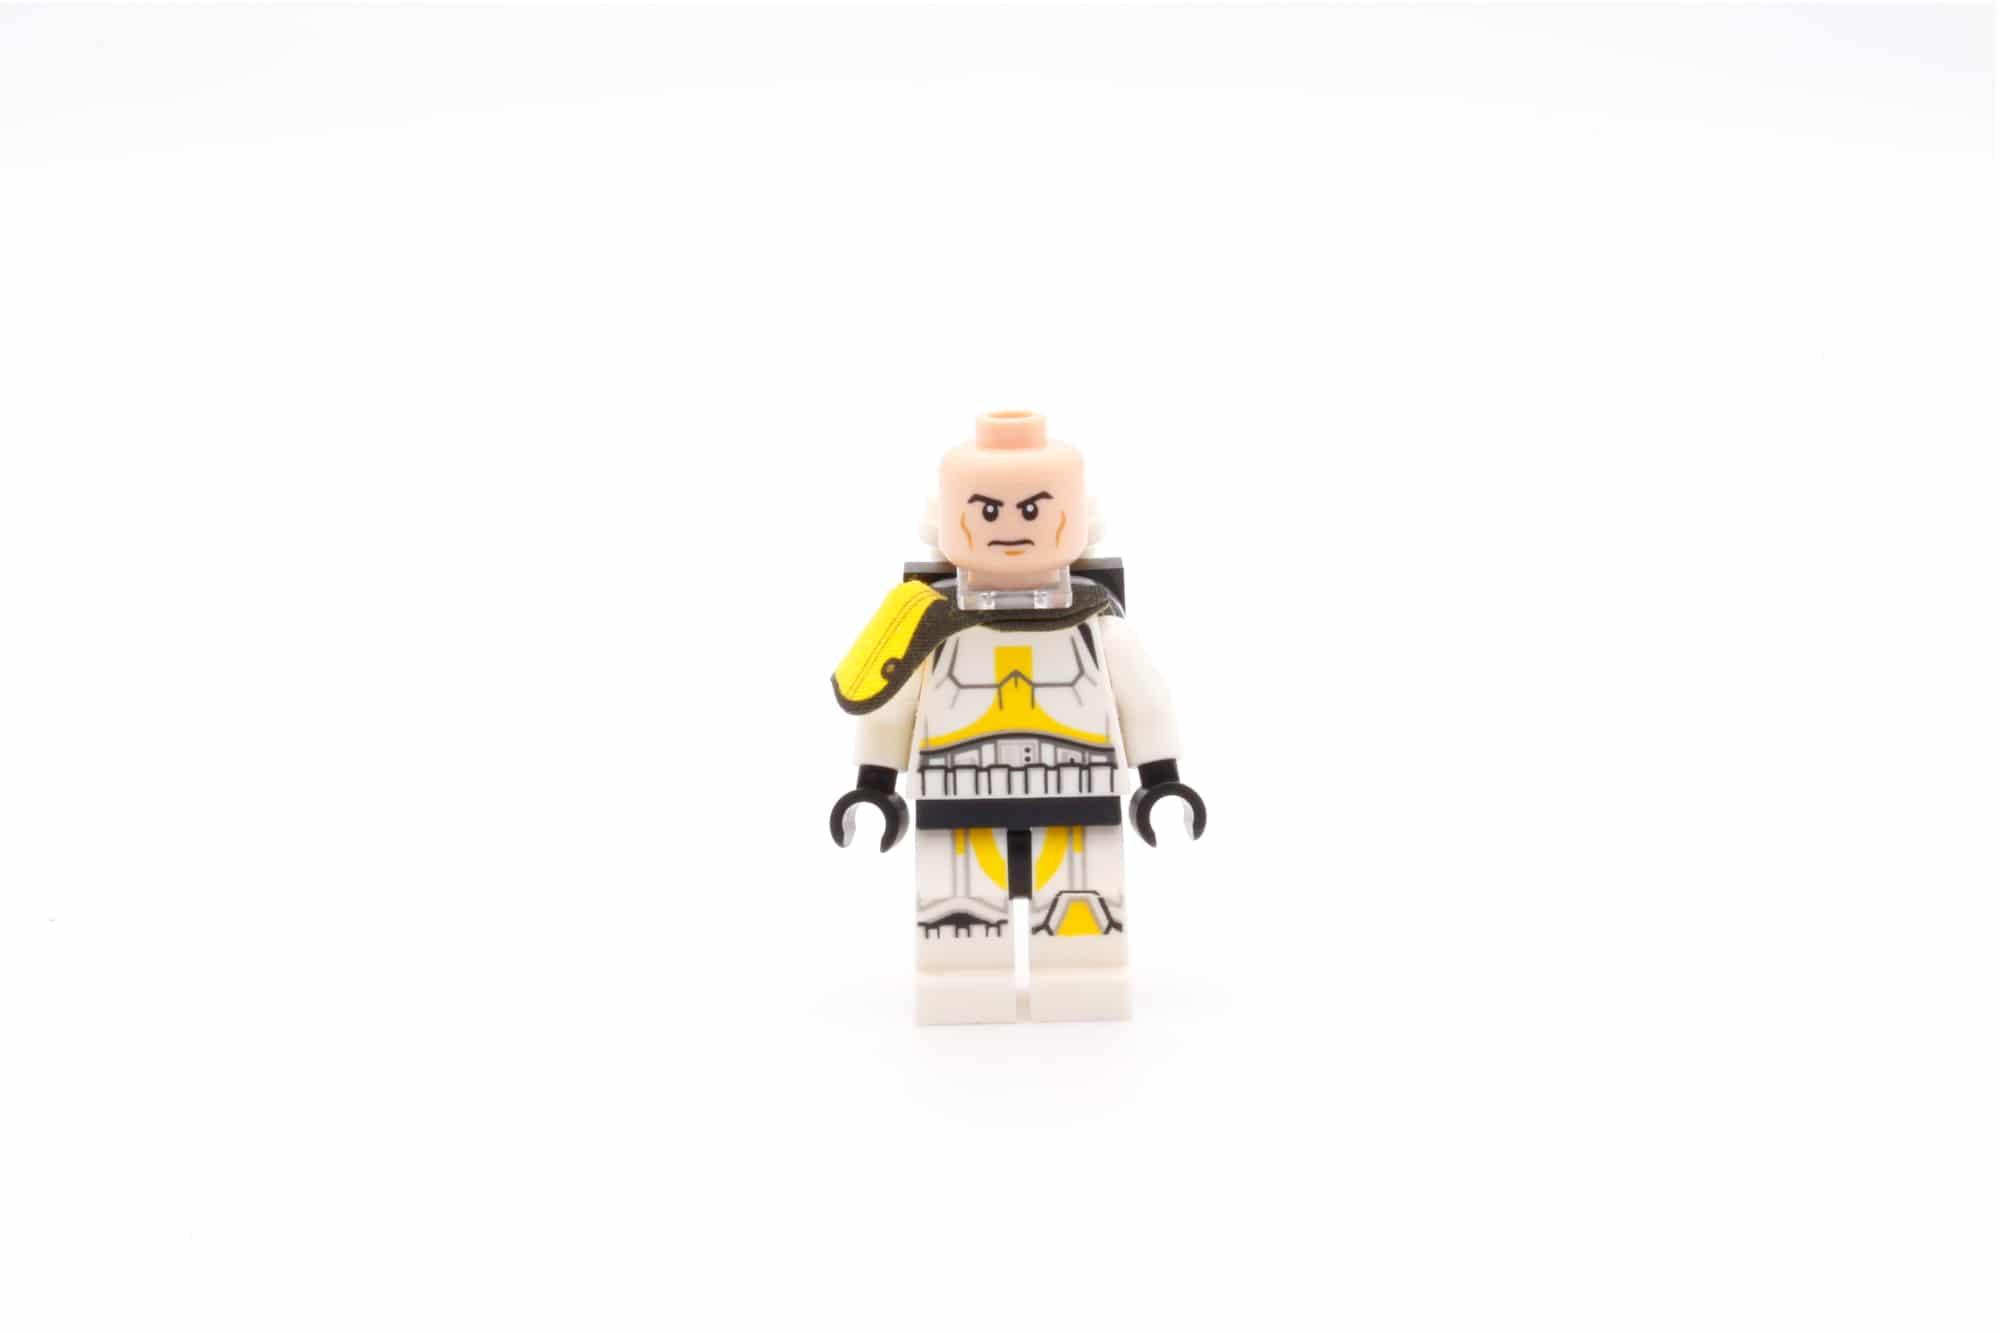 LEGO Star Wars 75311 Imperial Marauder Artillery Trooper Front Face